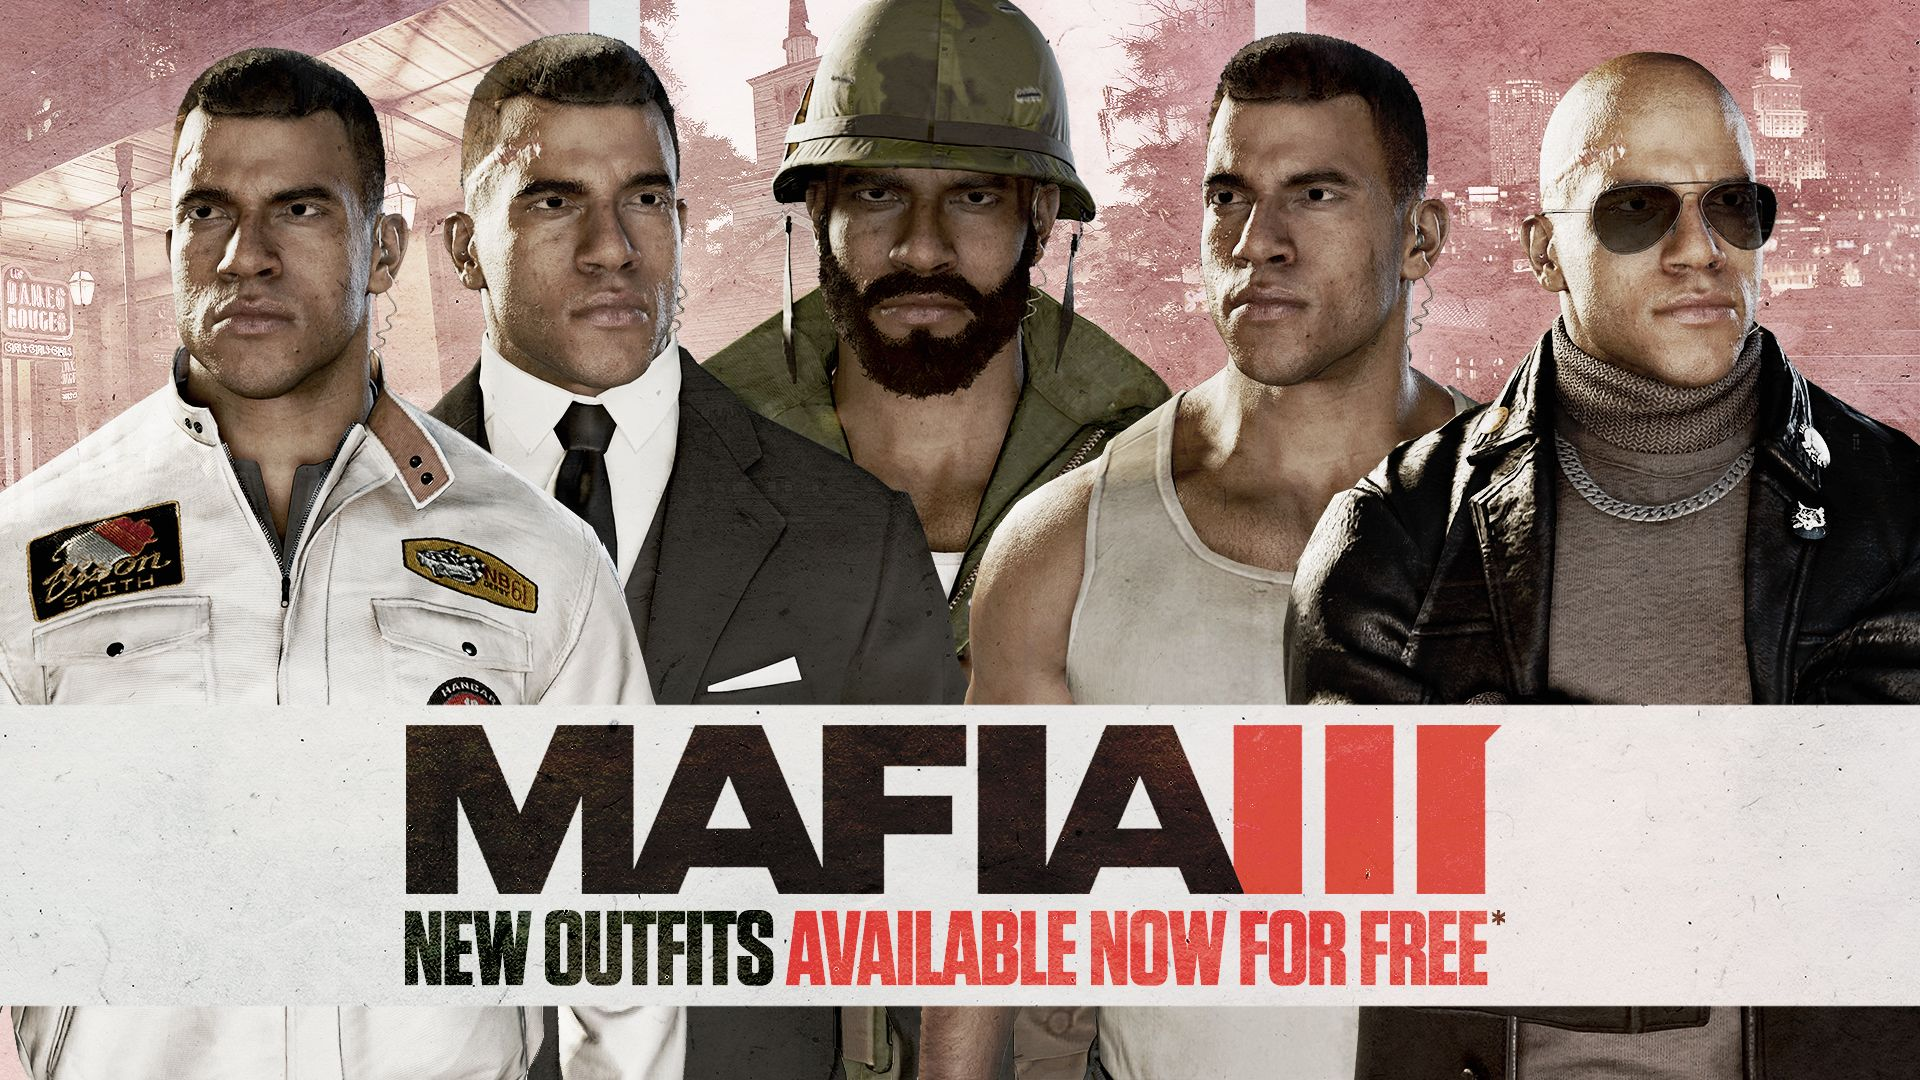 Mafia patch naked pics 14